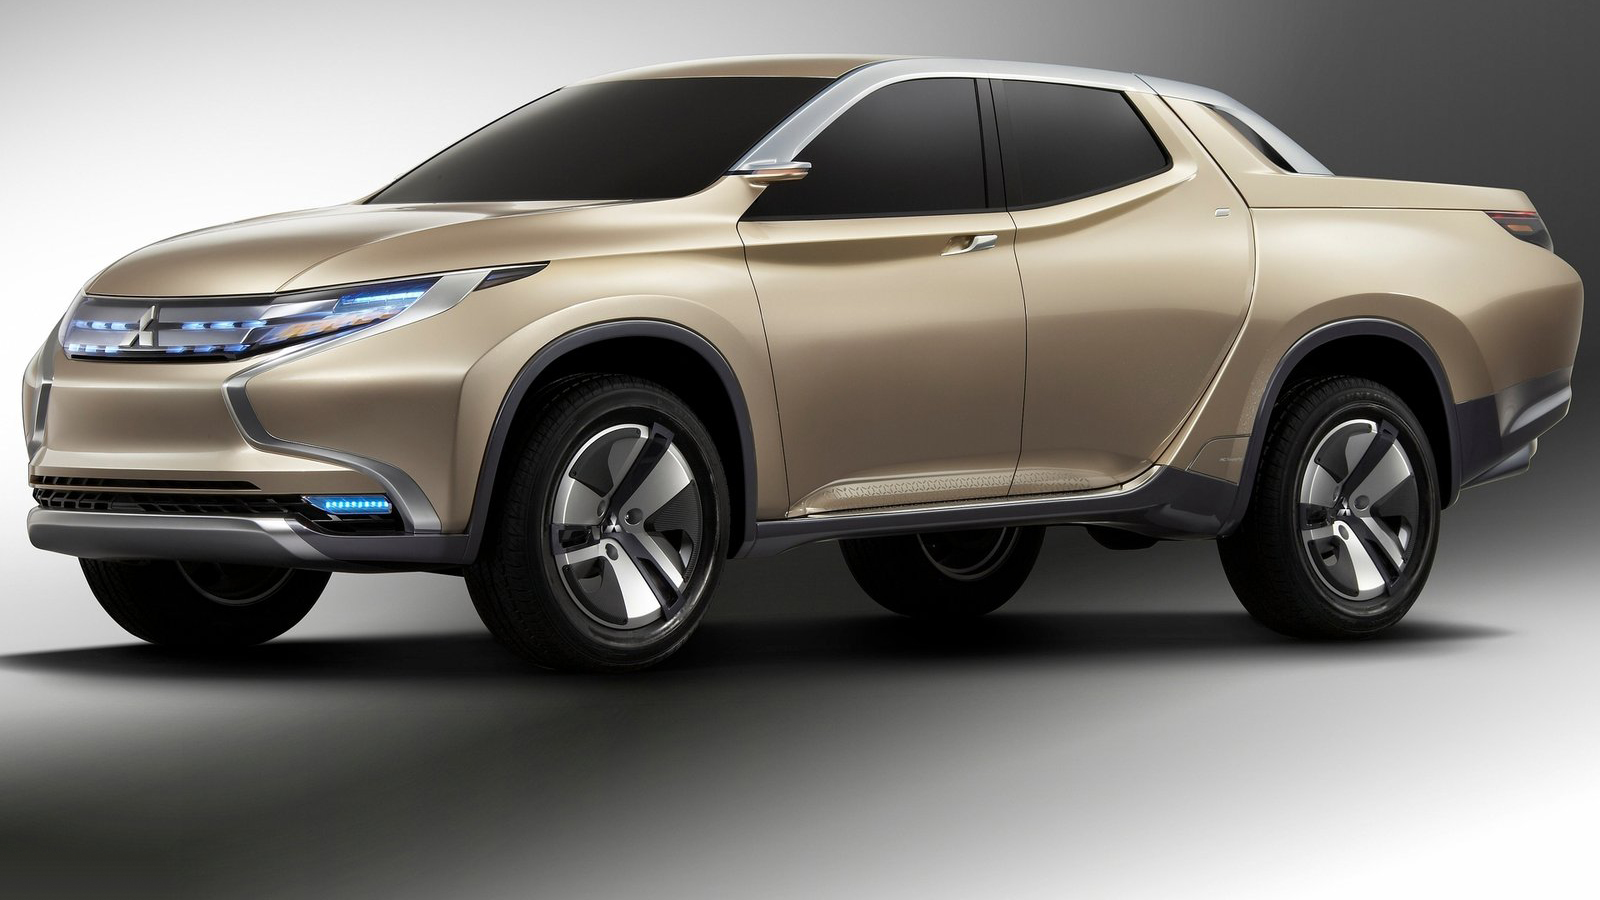 Nova Mitsubishi L200 2015 Preview | CARWP